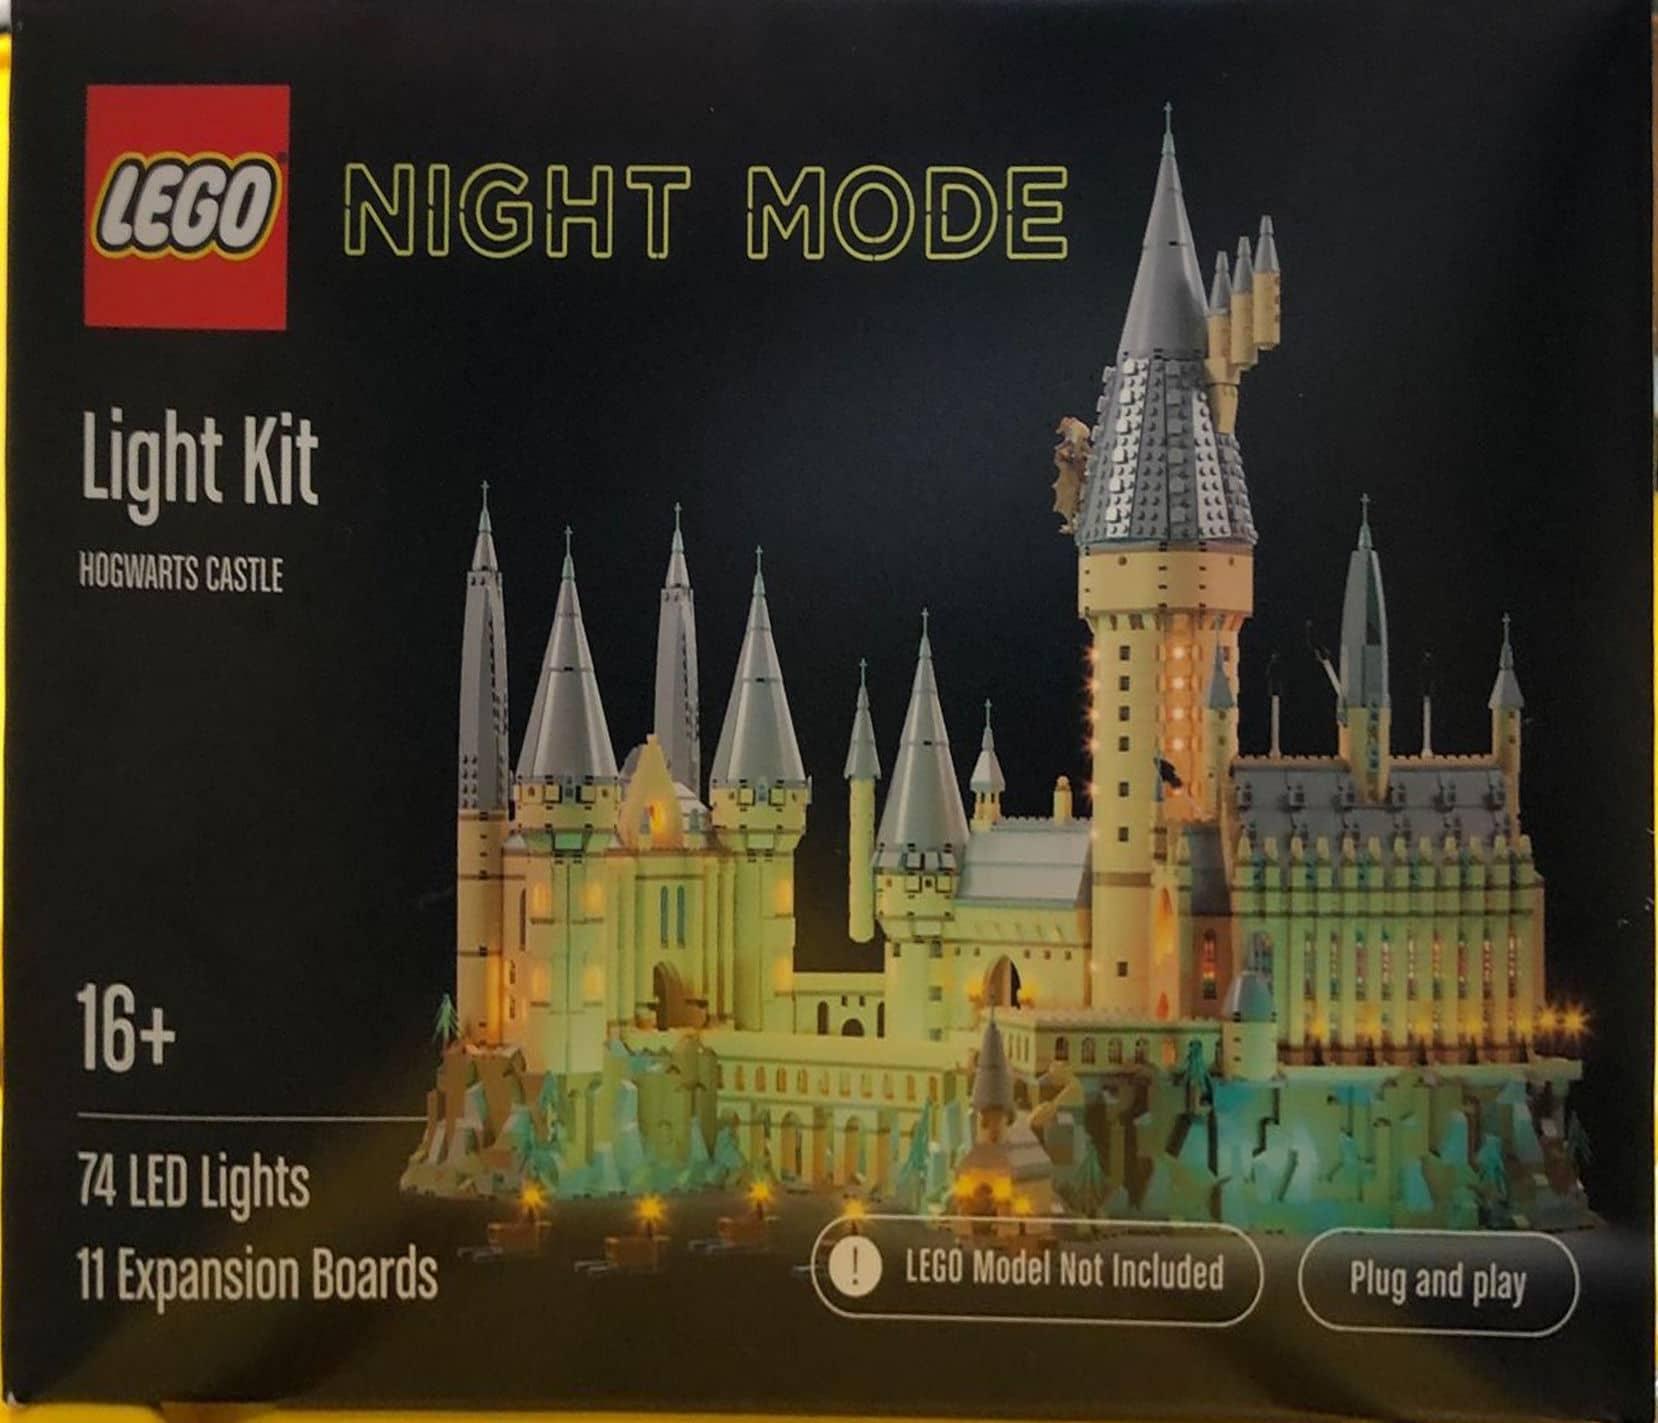 https://www.stonewars.de/wp-content/uploads/2020/02/lego-offizielle-led-sets-2.jpg